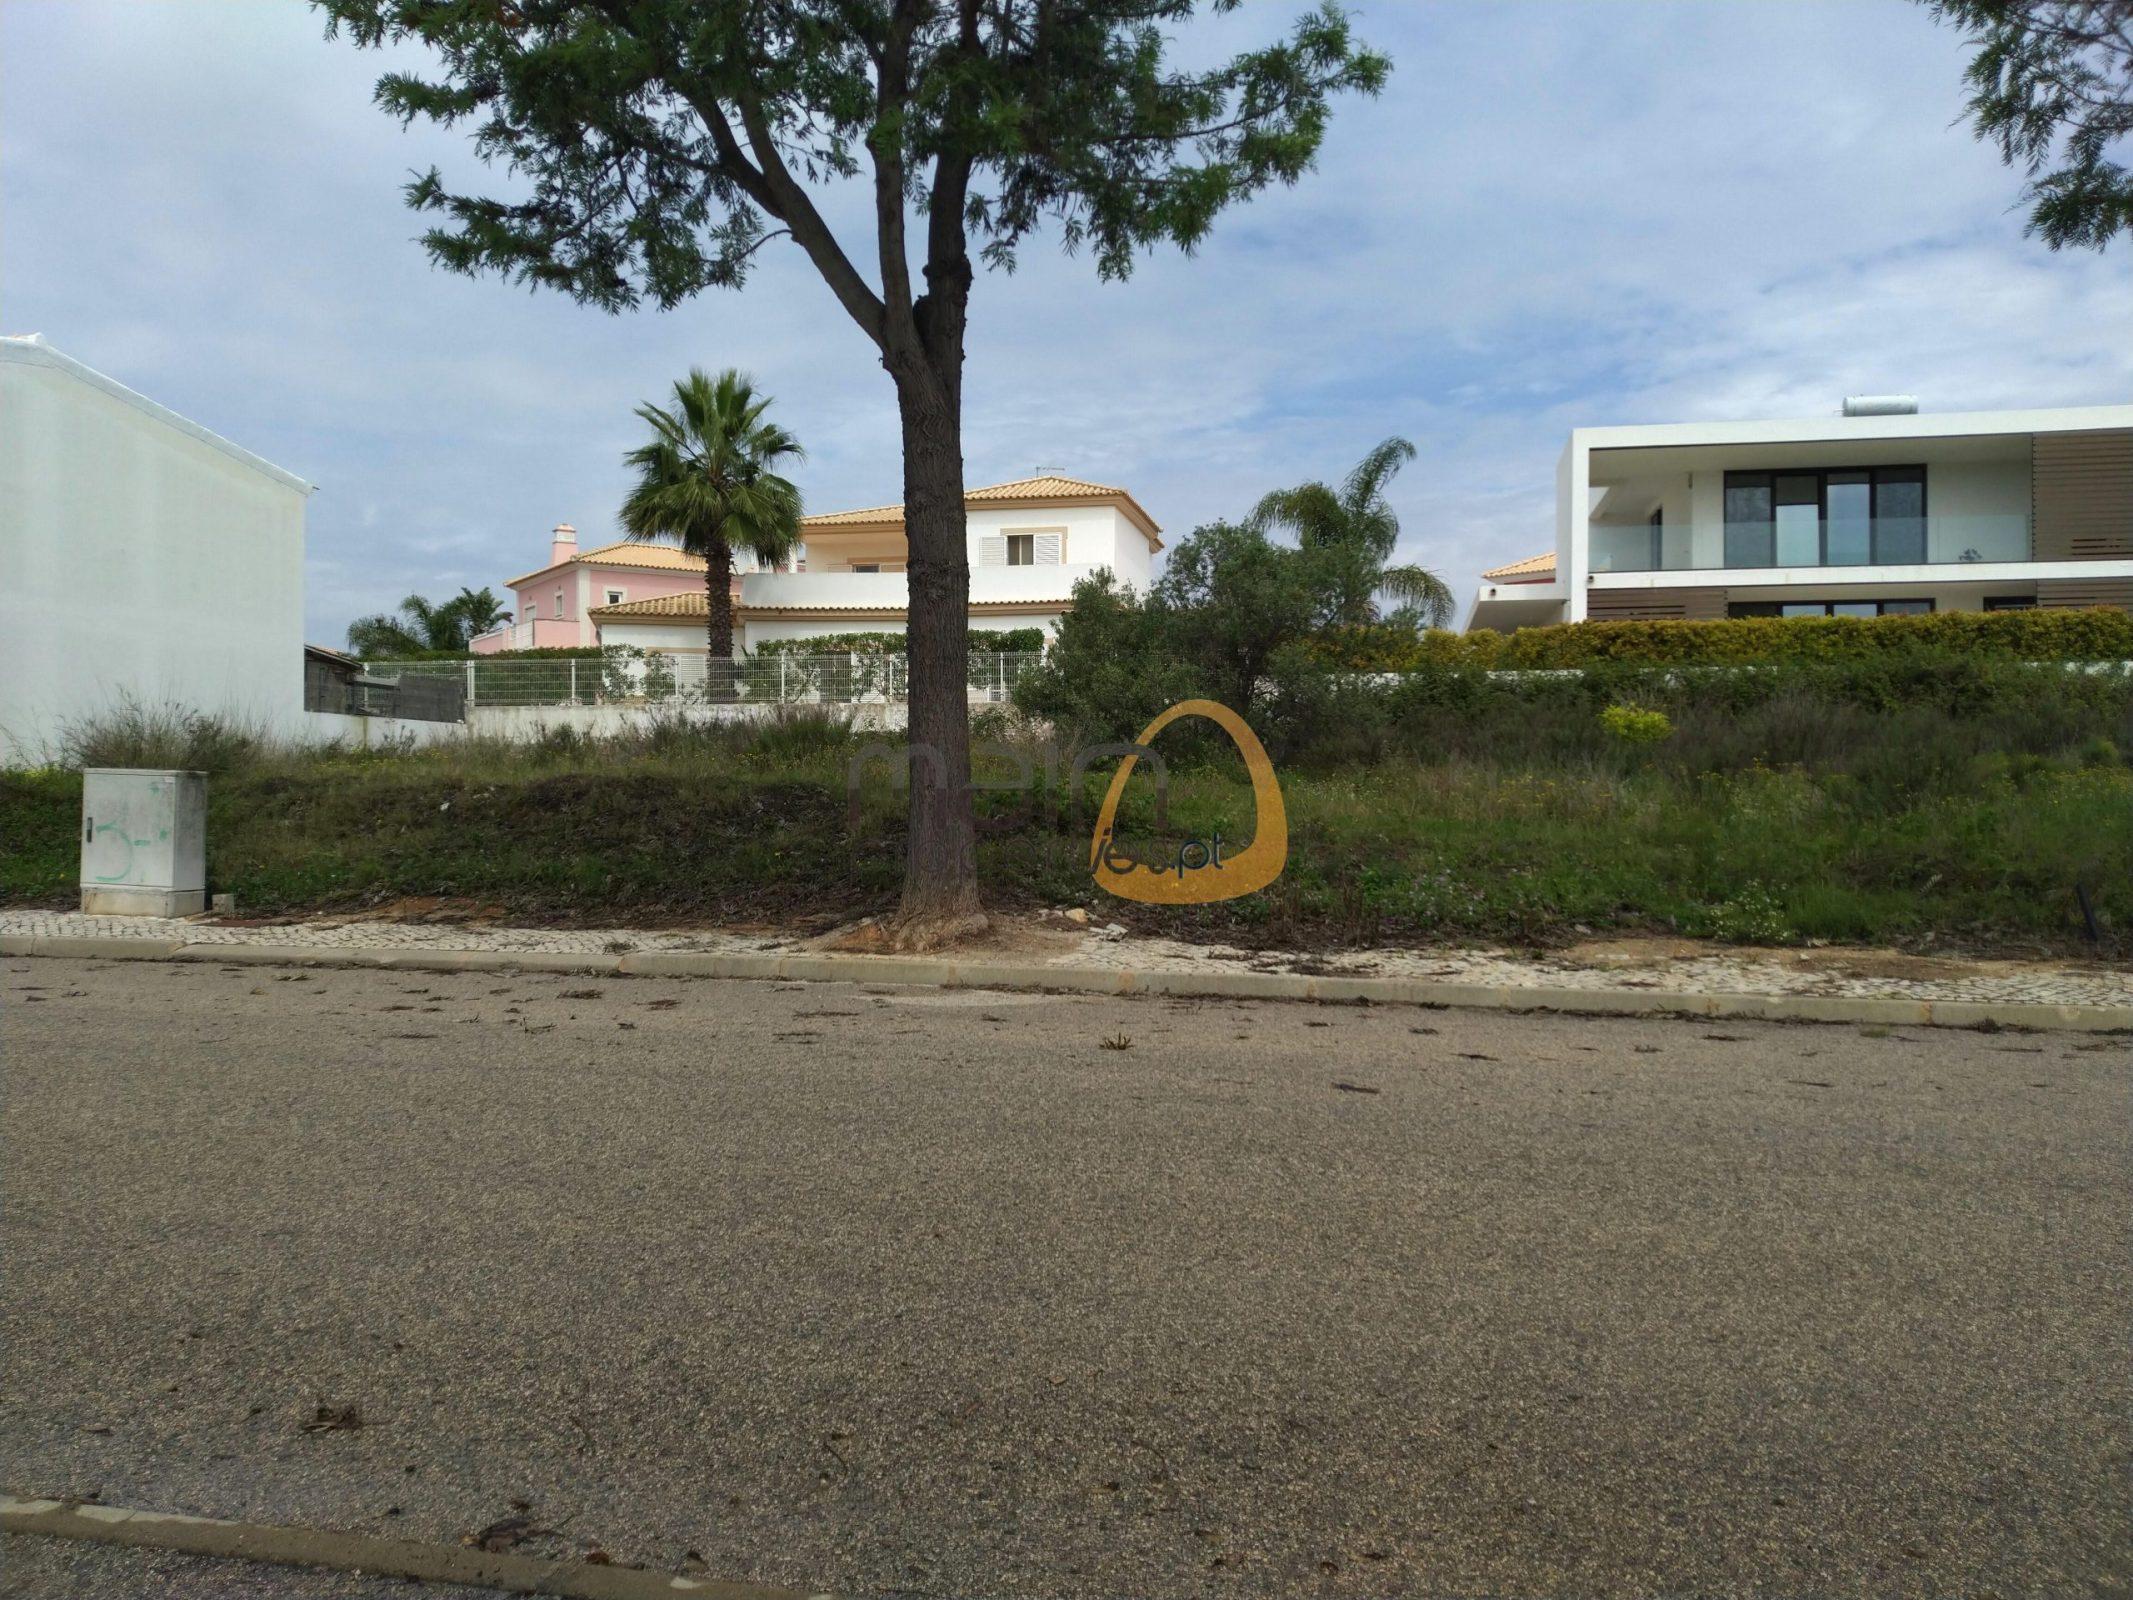 [:pt]Terreno para construção de moradia em Montenegro - Faro : Algarve : Portugal : Terreno 10 :: MR039[:en]Land for Villa construction in Montenegro -  Faro : Algarve : Portugal :: Land 10 :: MainProperties :: MR039[:]